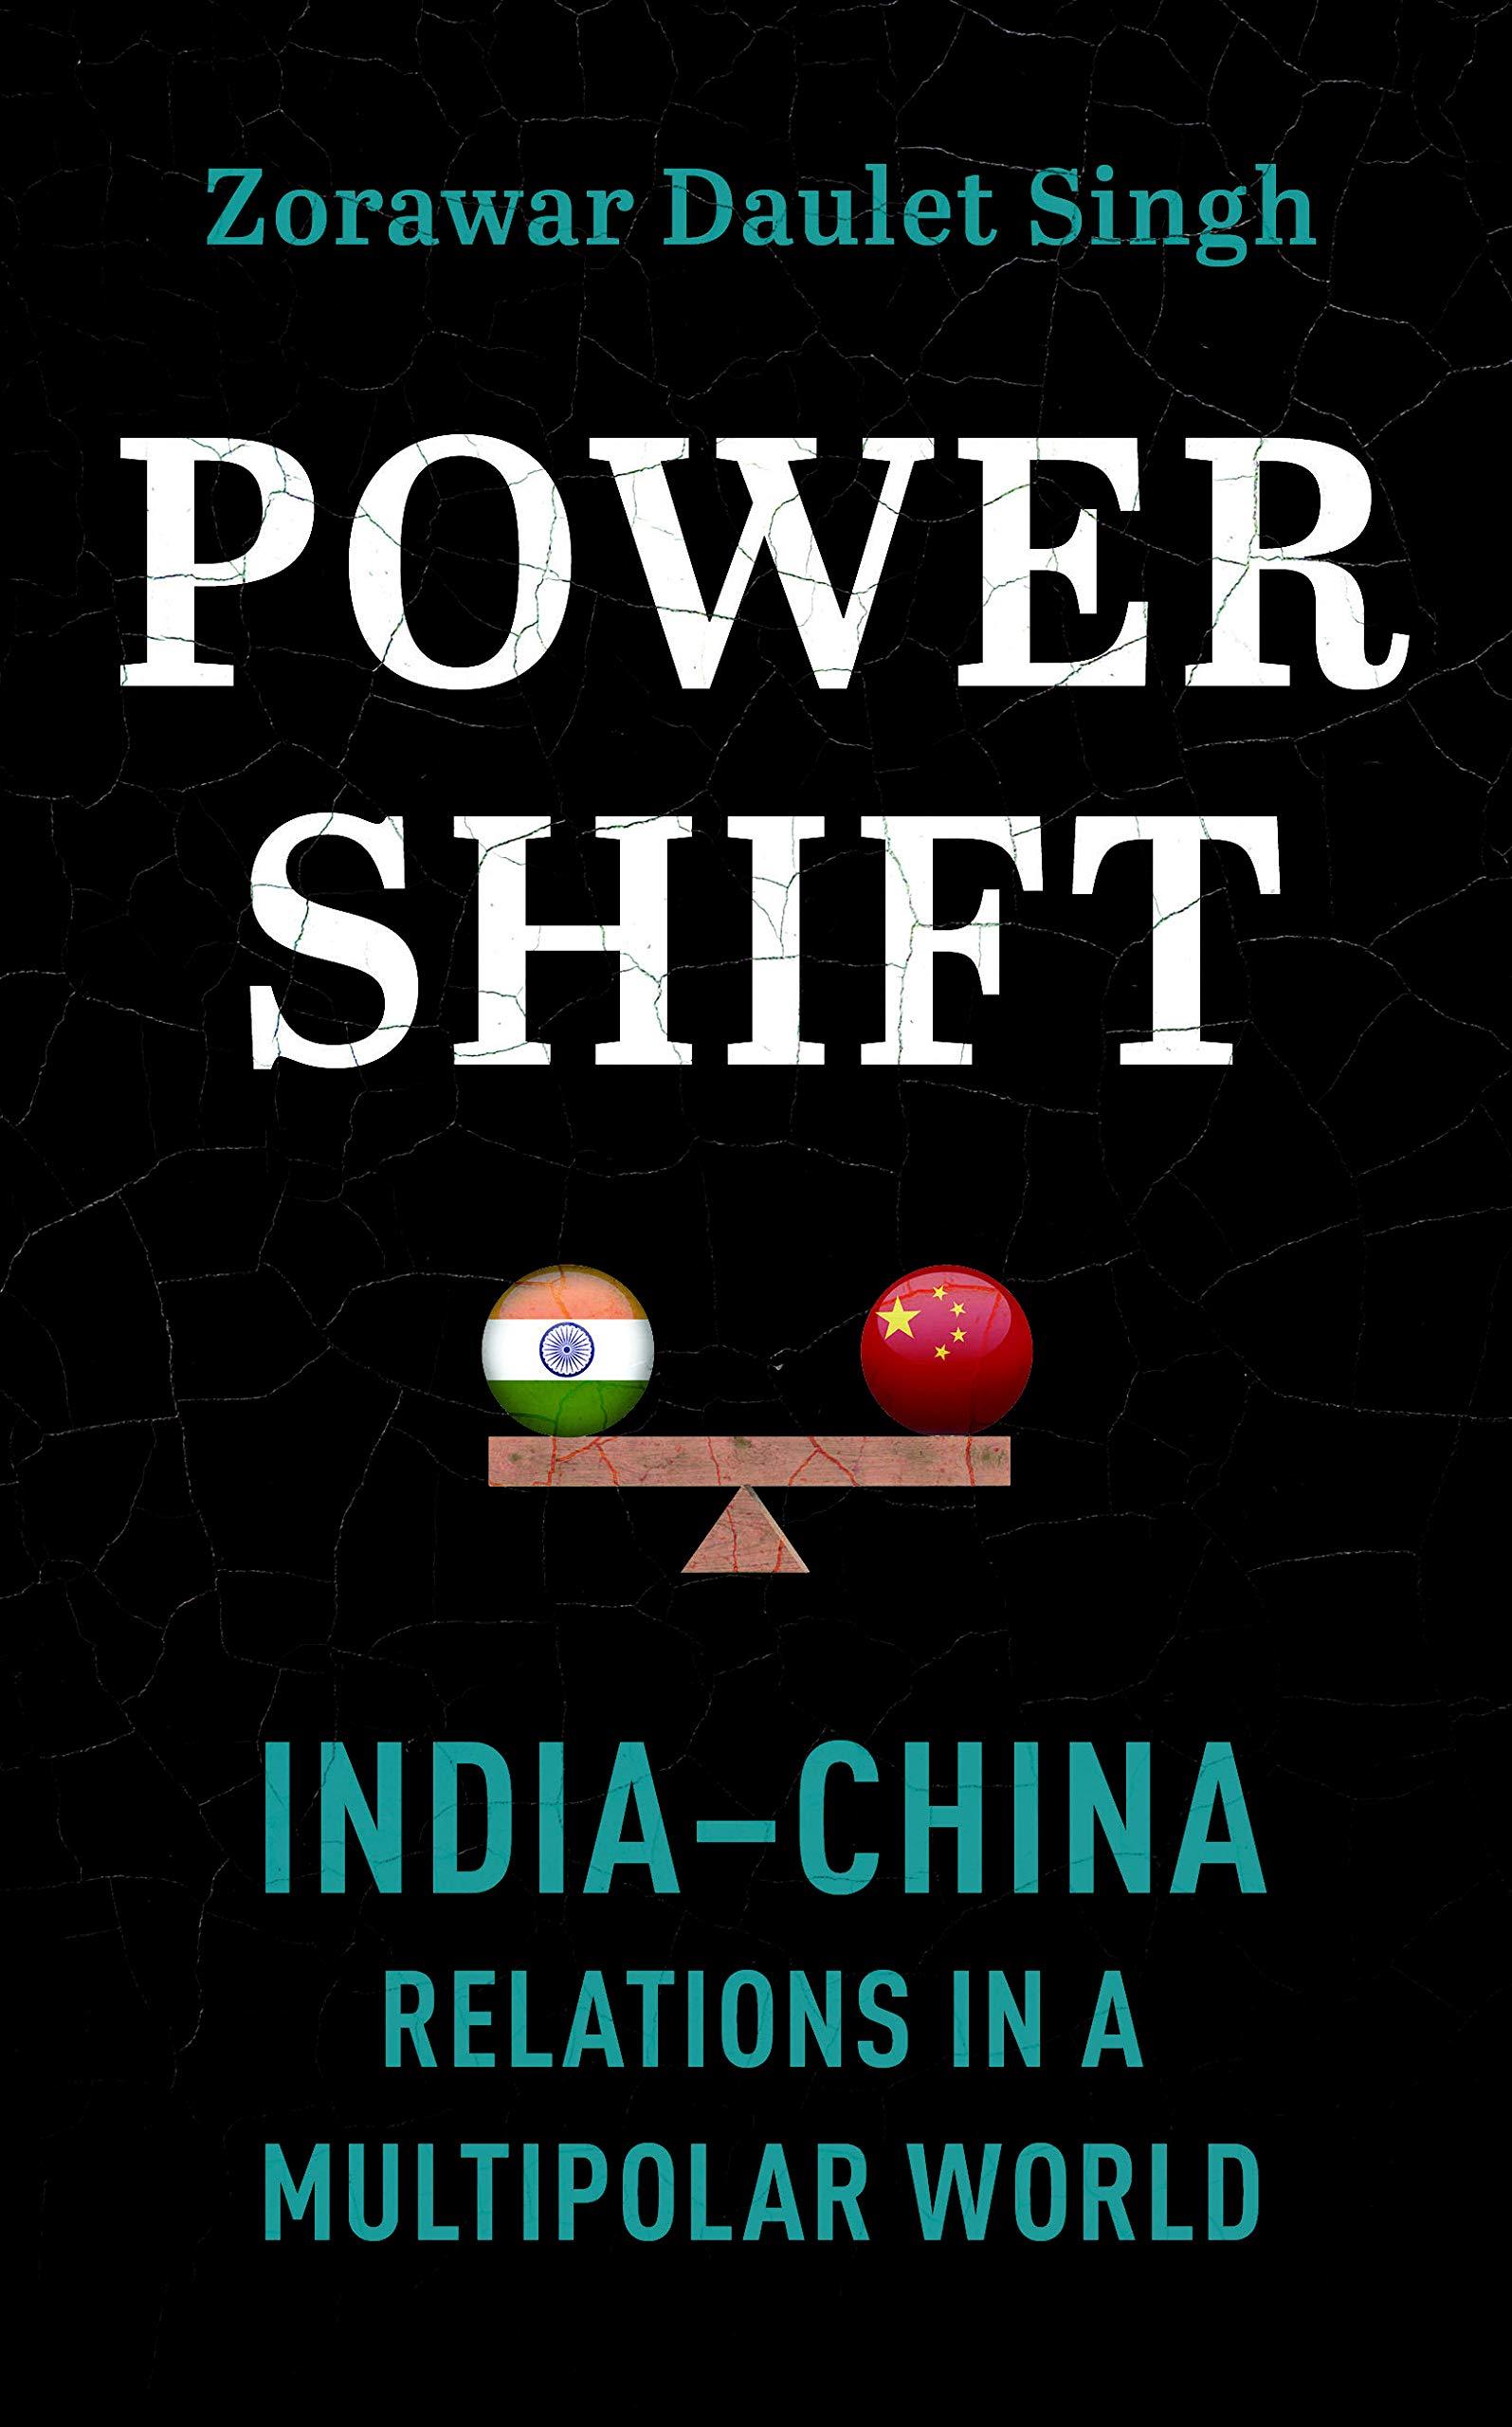 Powershift: India-China Relations in a Multipolar World Book by Zorawar Daulet Singh, Macmillan, Rs 650